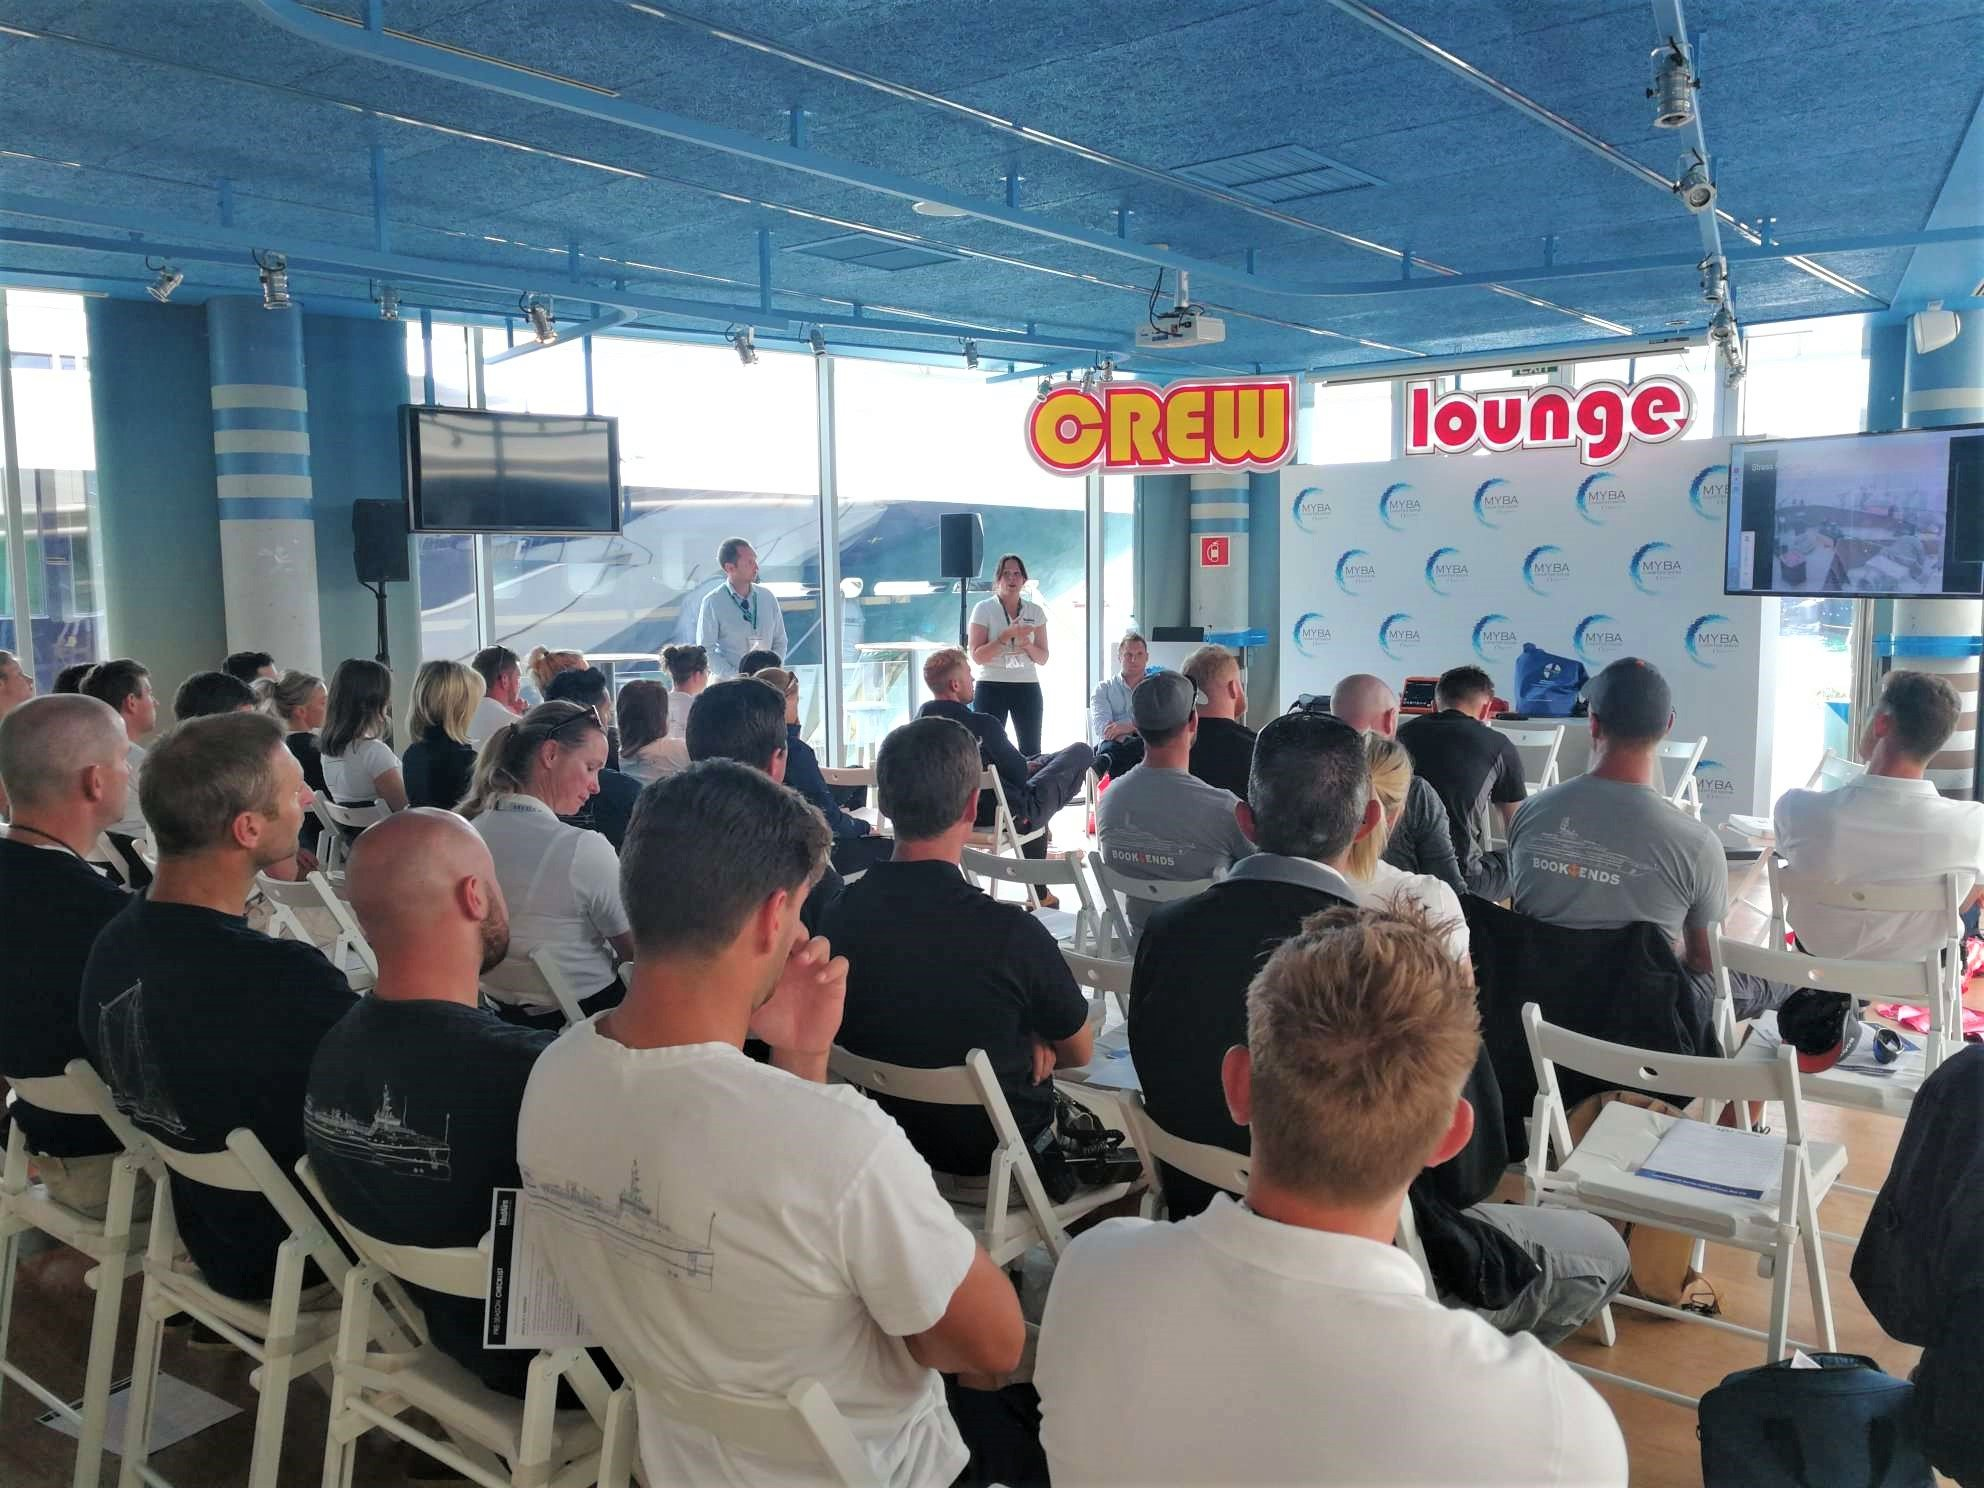 MYBA19: ACREW hosts medical, cyber seminars